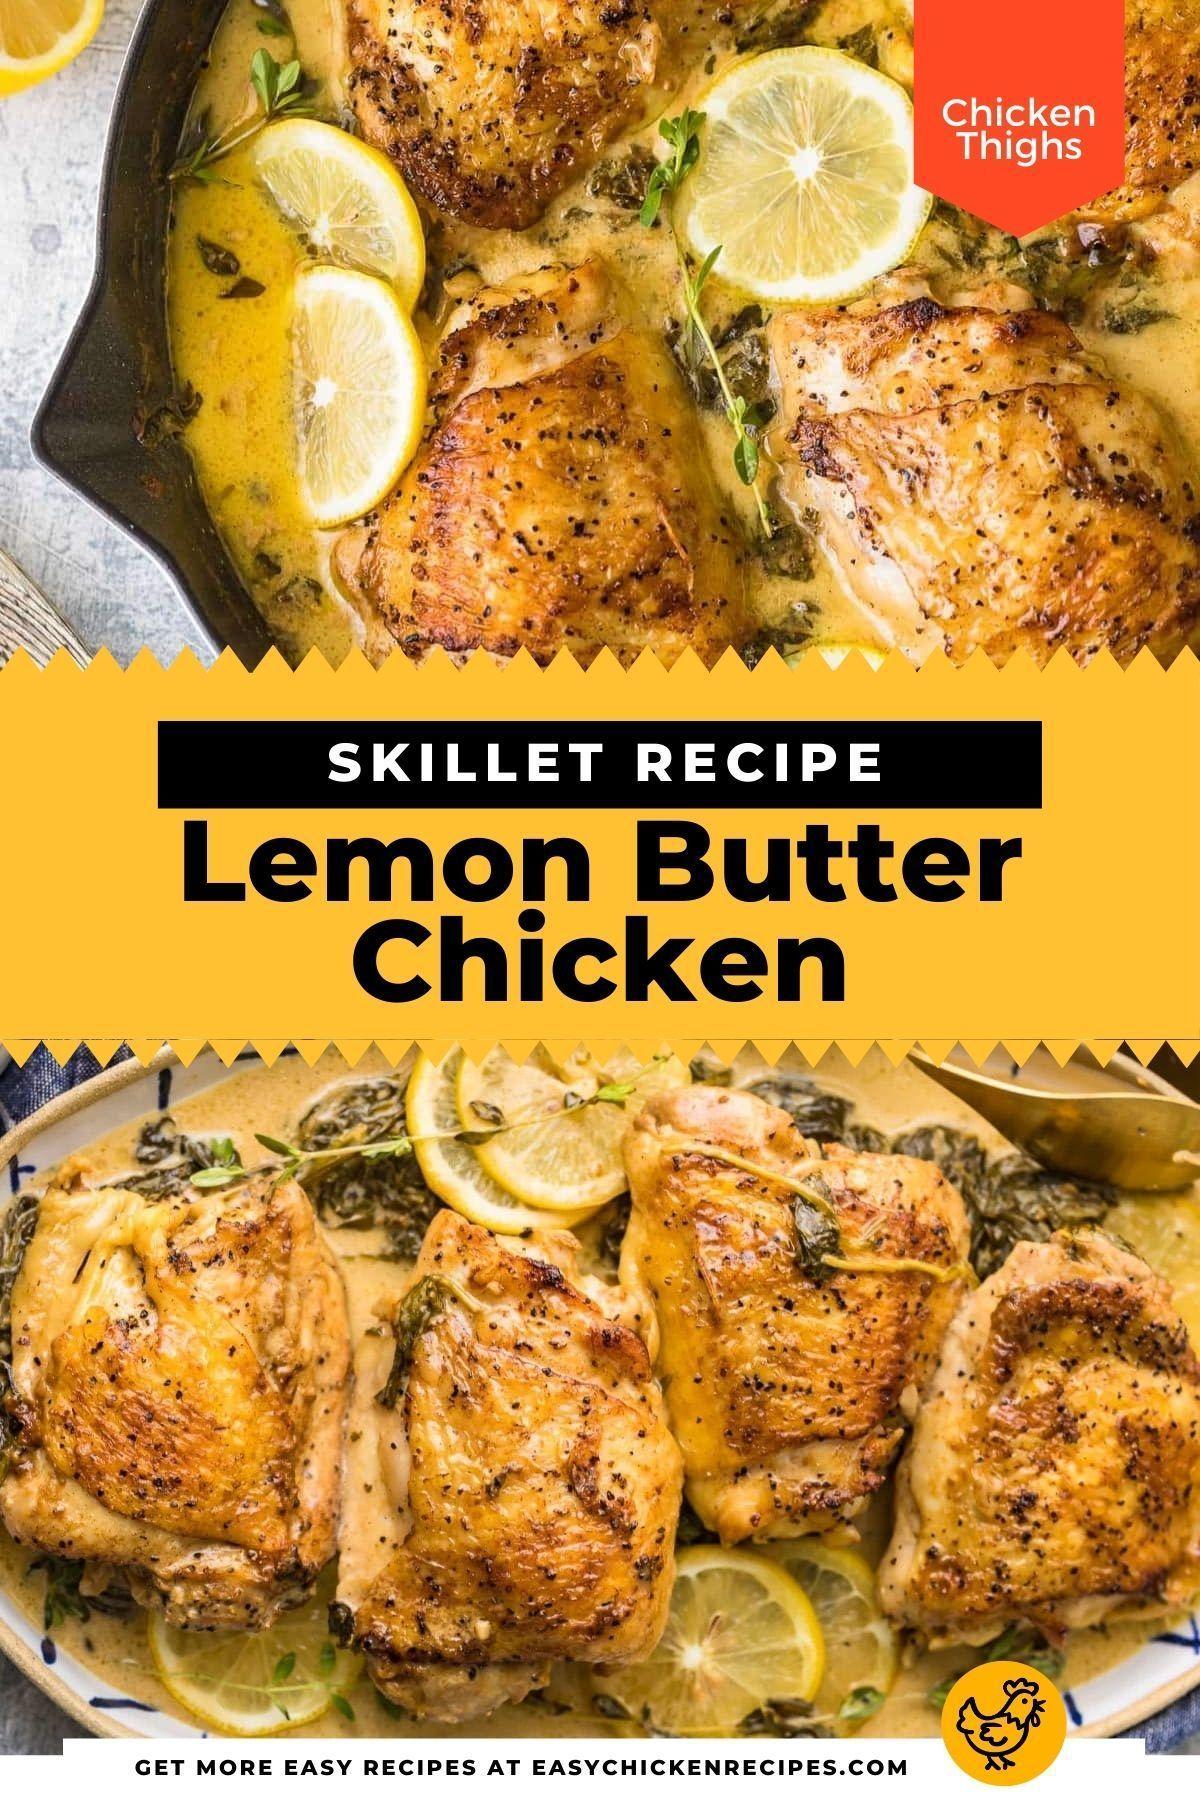 Lemon Butter Chicken Recipe Creamy Easy Chicken Recipes Video Recipe Easy Chicken Recipes Free Chicken Recipes Yummy Chicken Recipes